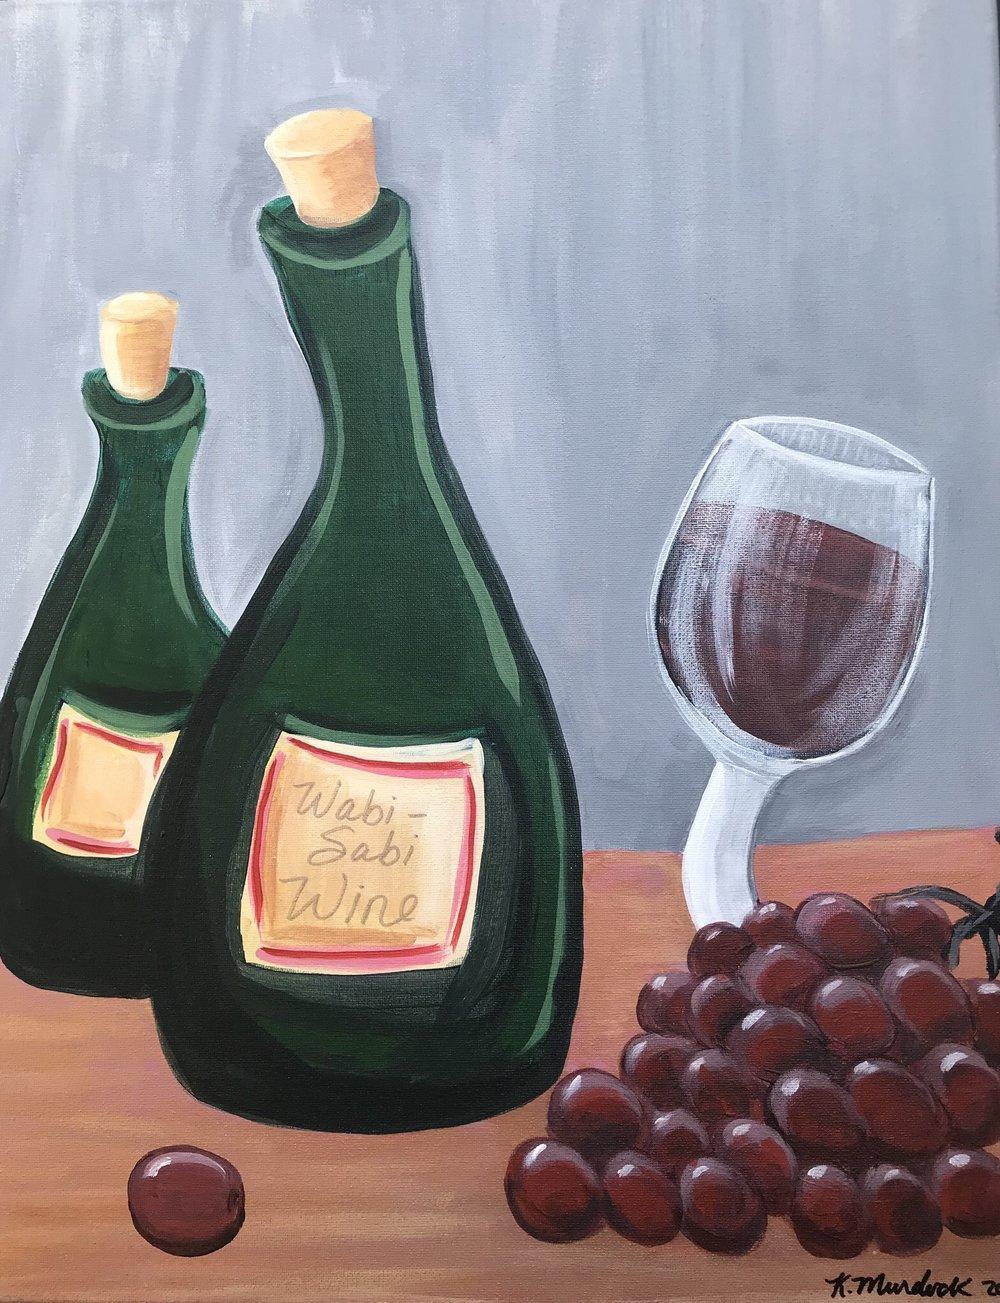 Wabi-Sabi Wine II